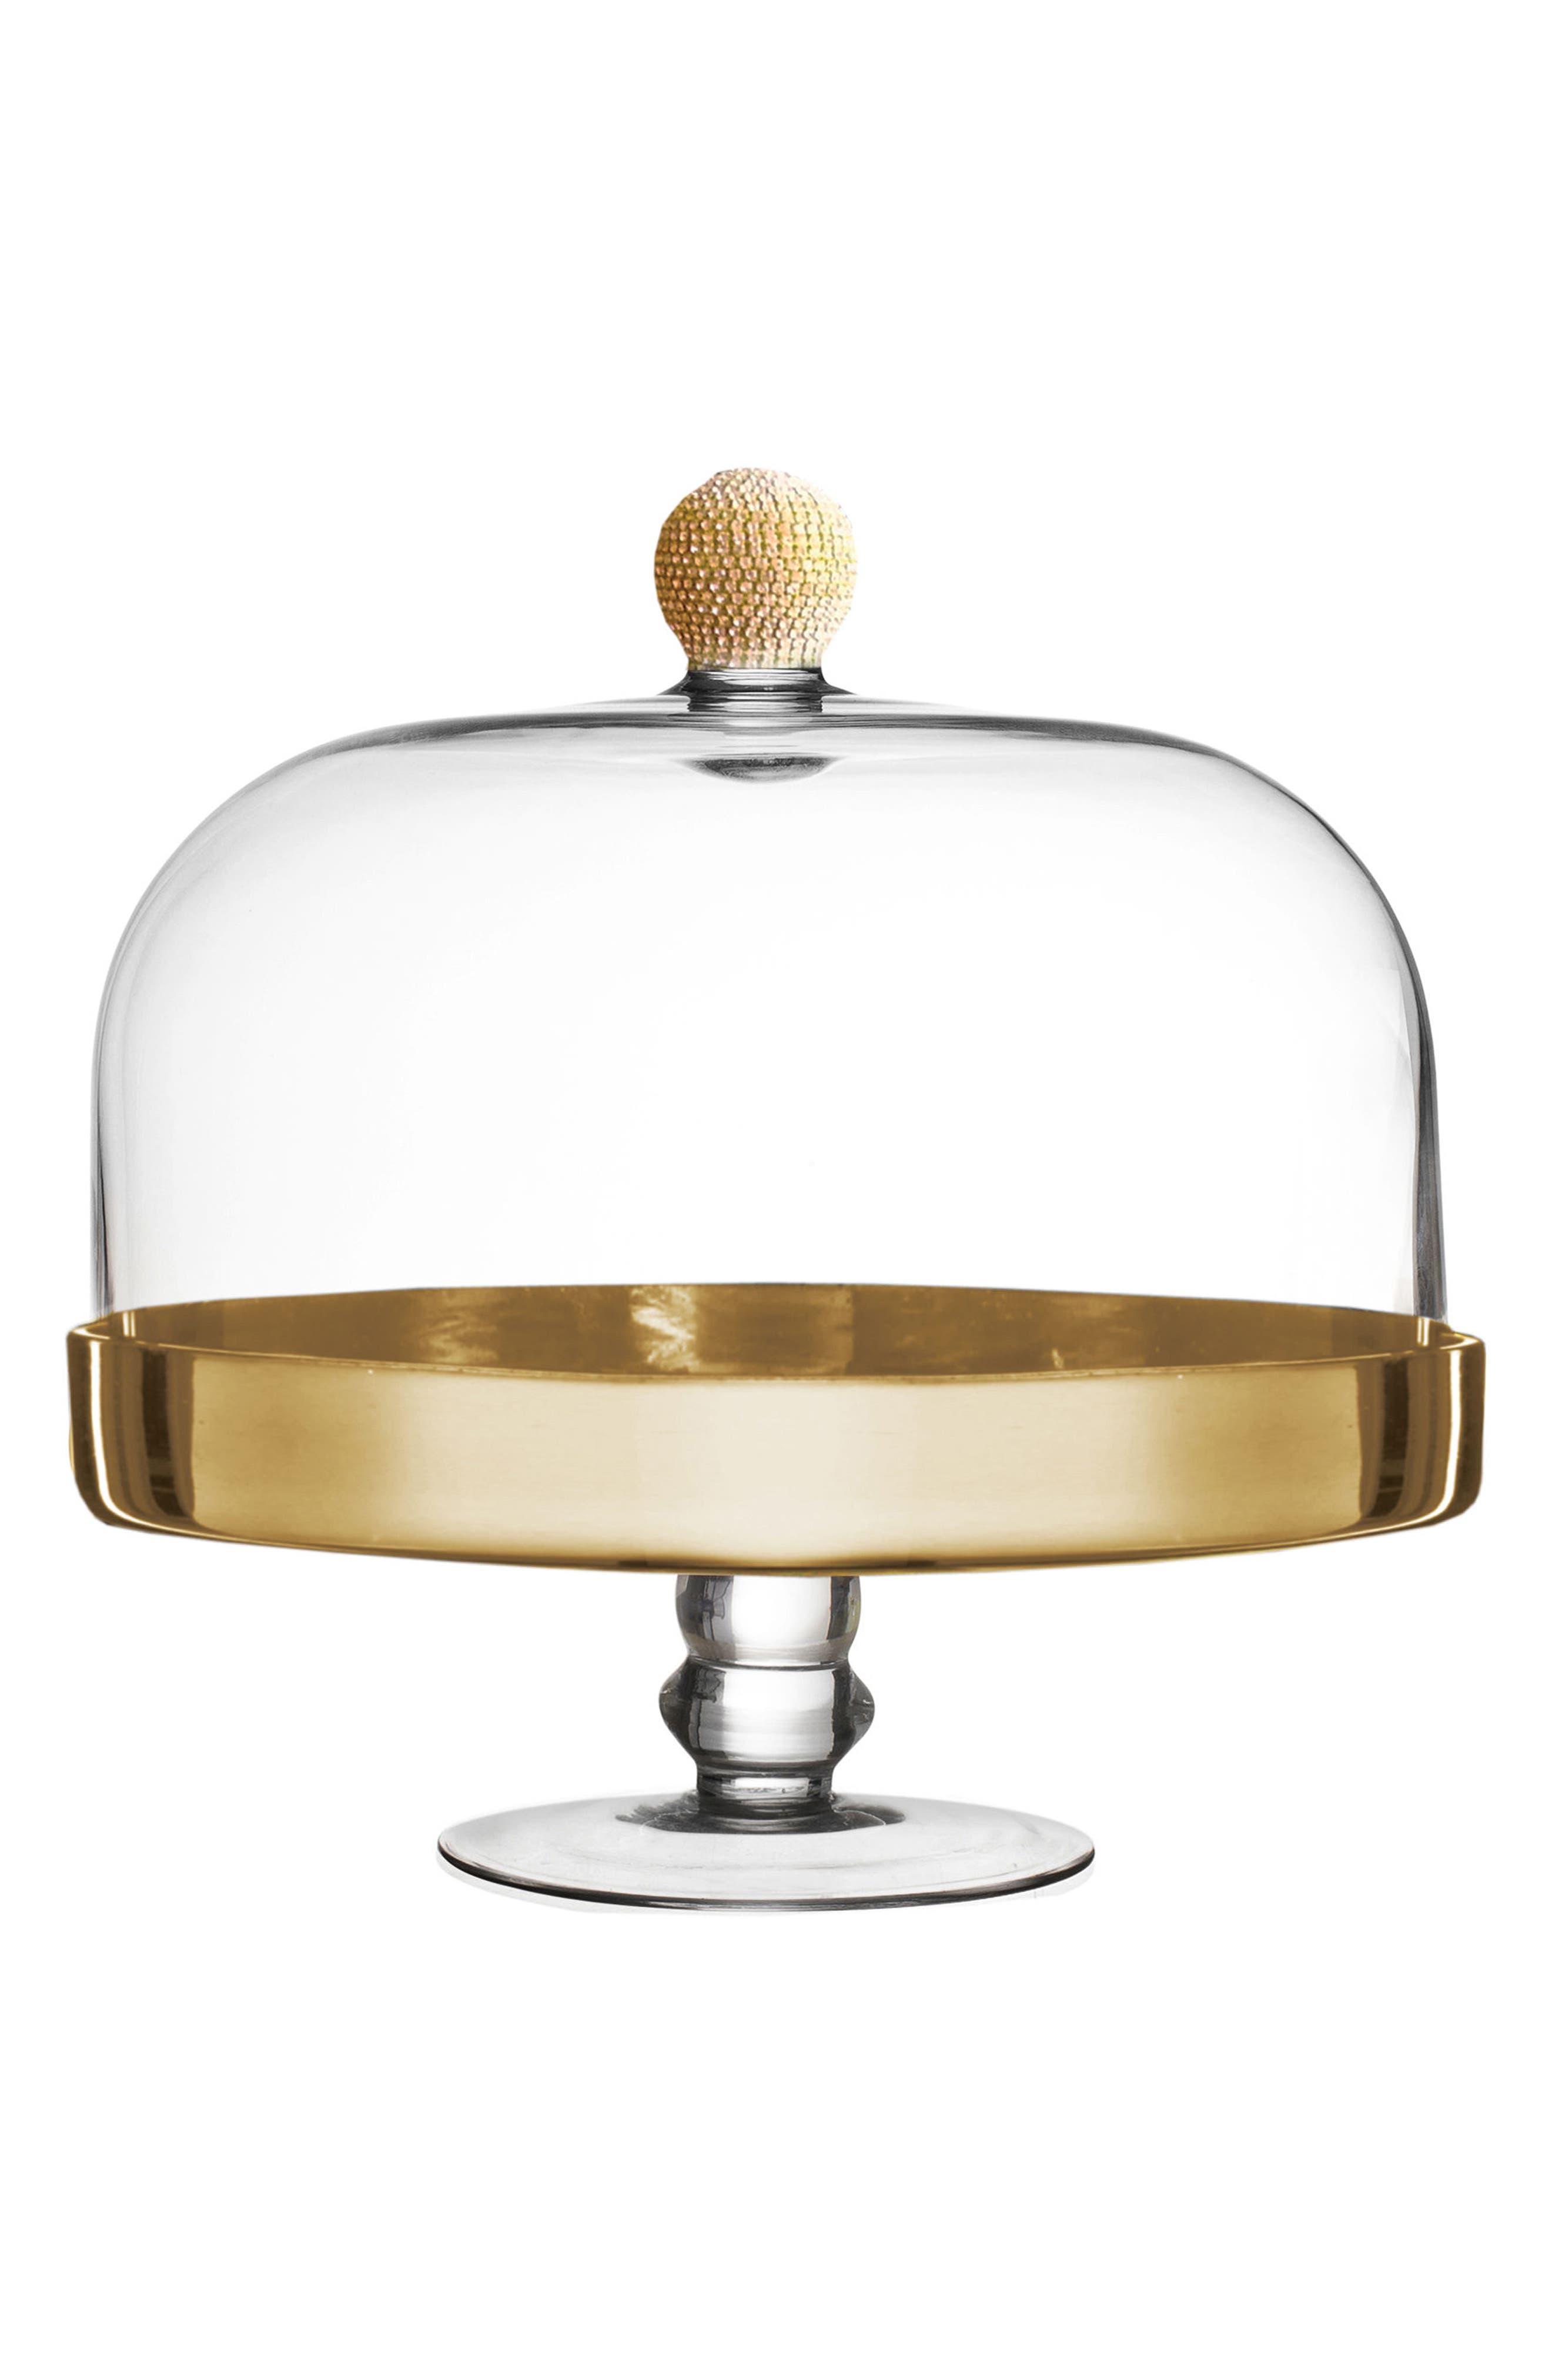 Gold Medley Pedestal Plate & Dome,                         Main,                         color, Gold